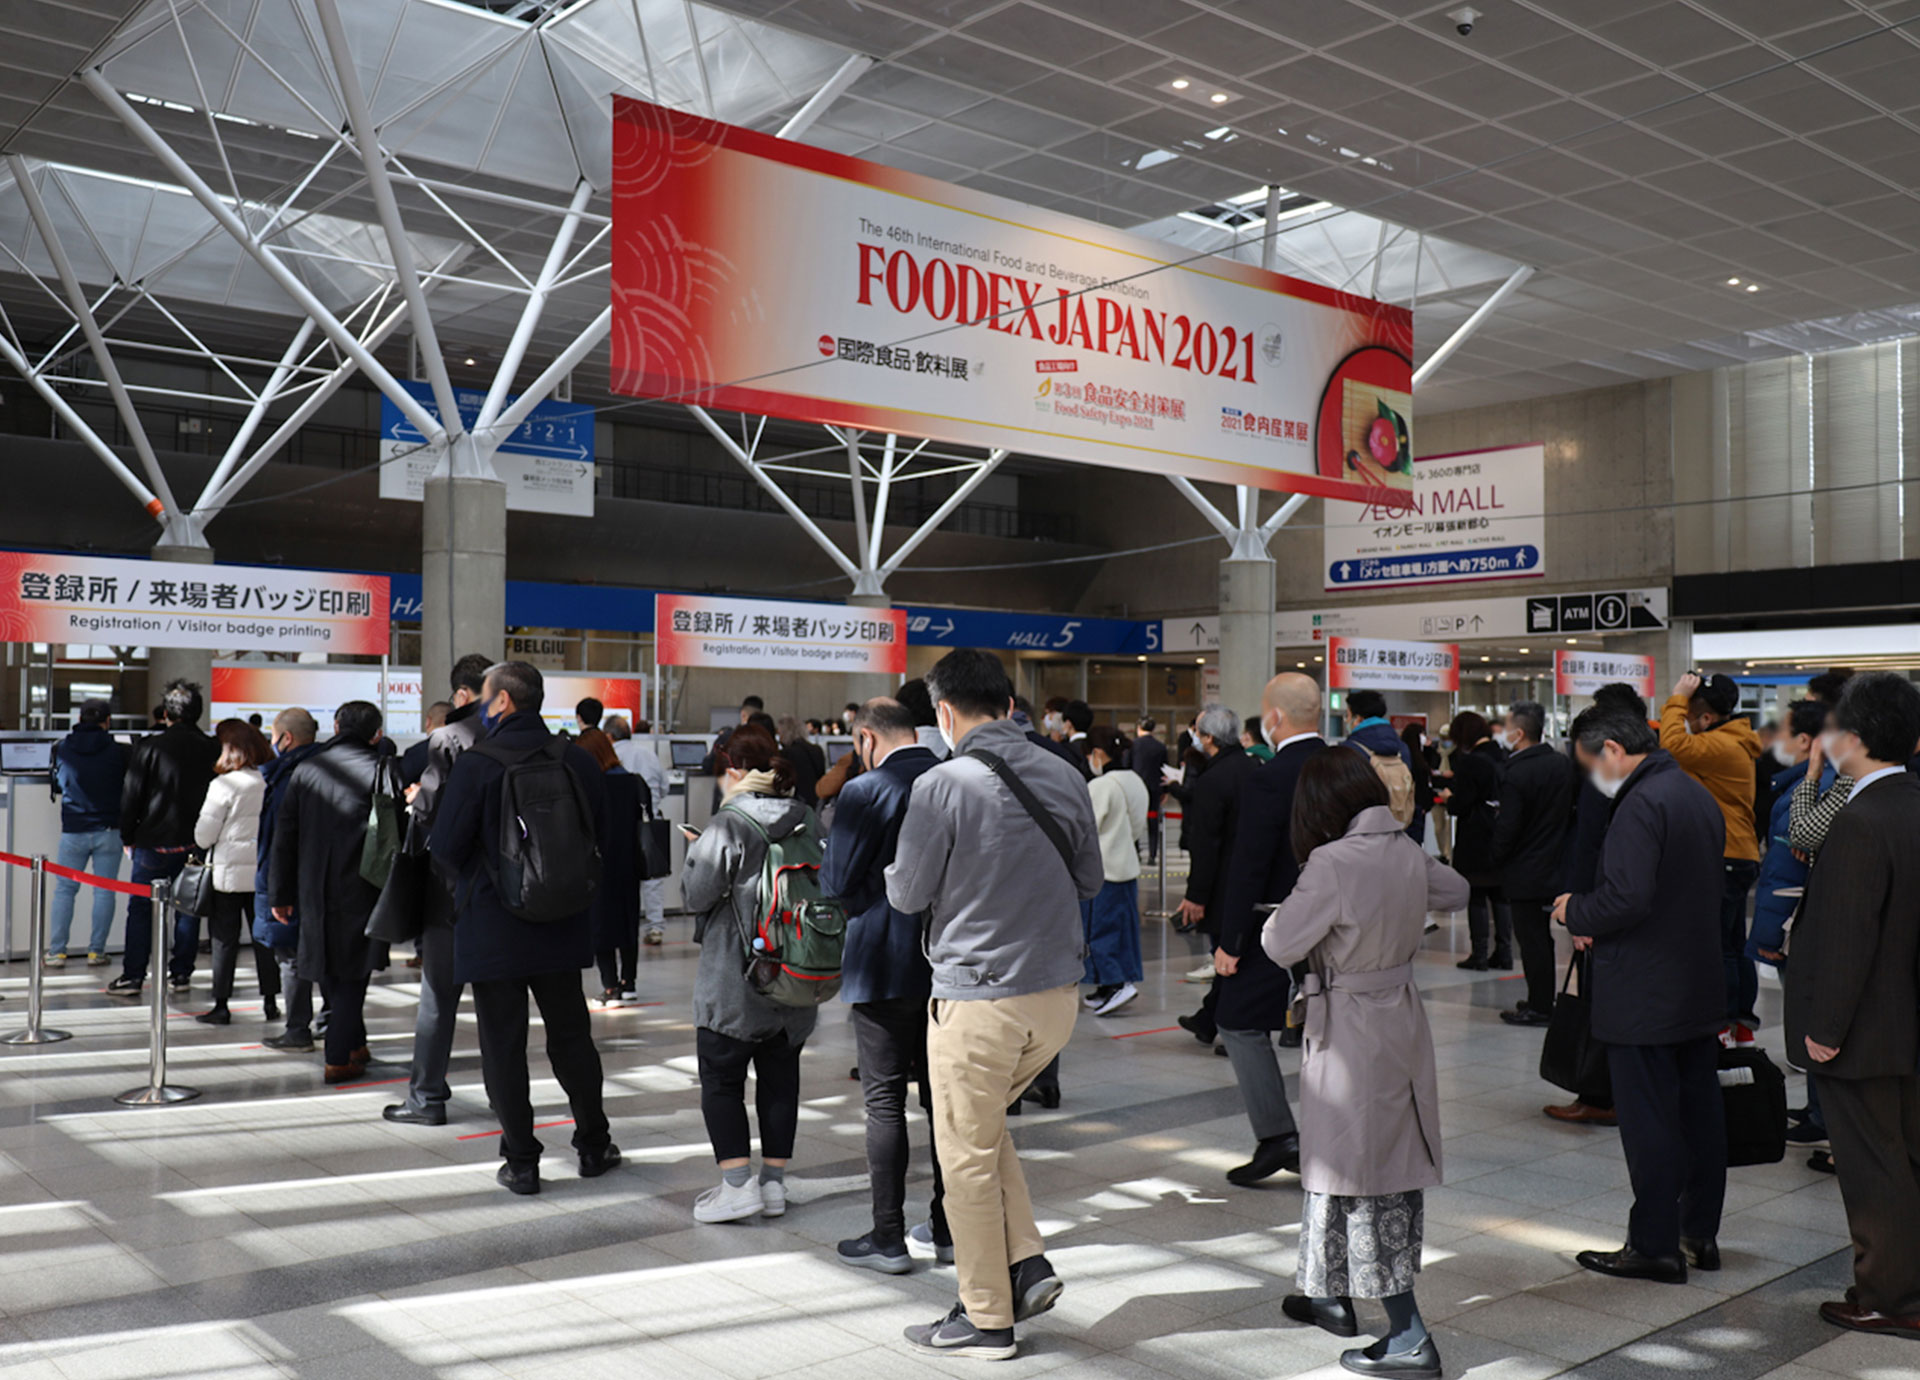 BIOFACH JAPAN Pavillion in FOODEX JAPAN 2021